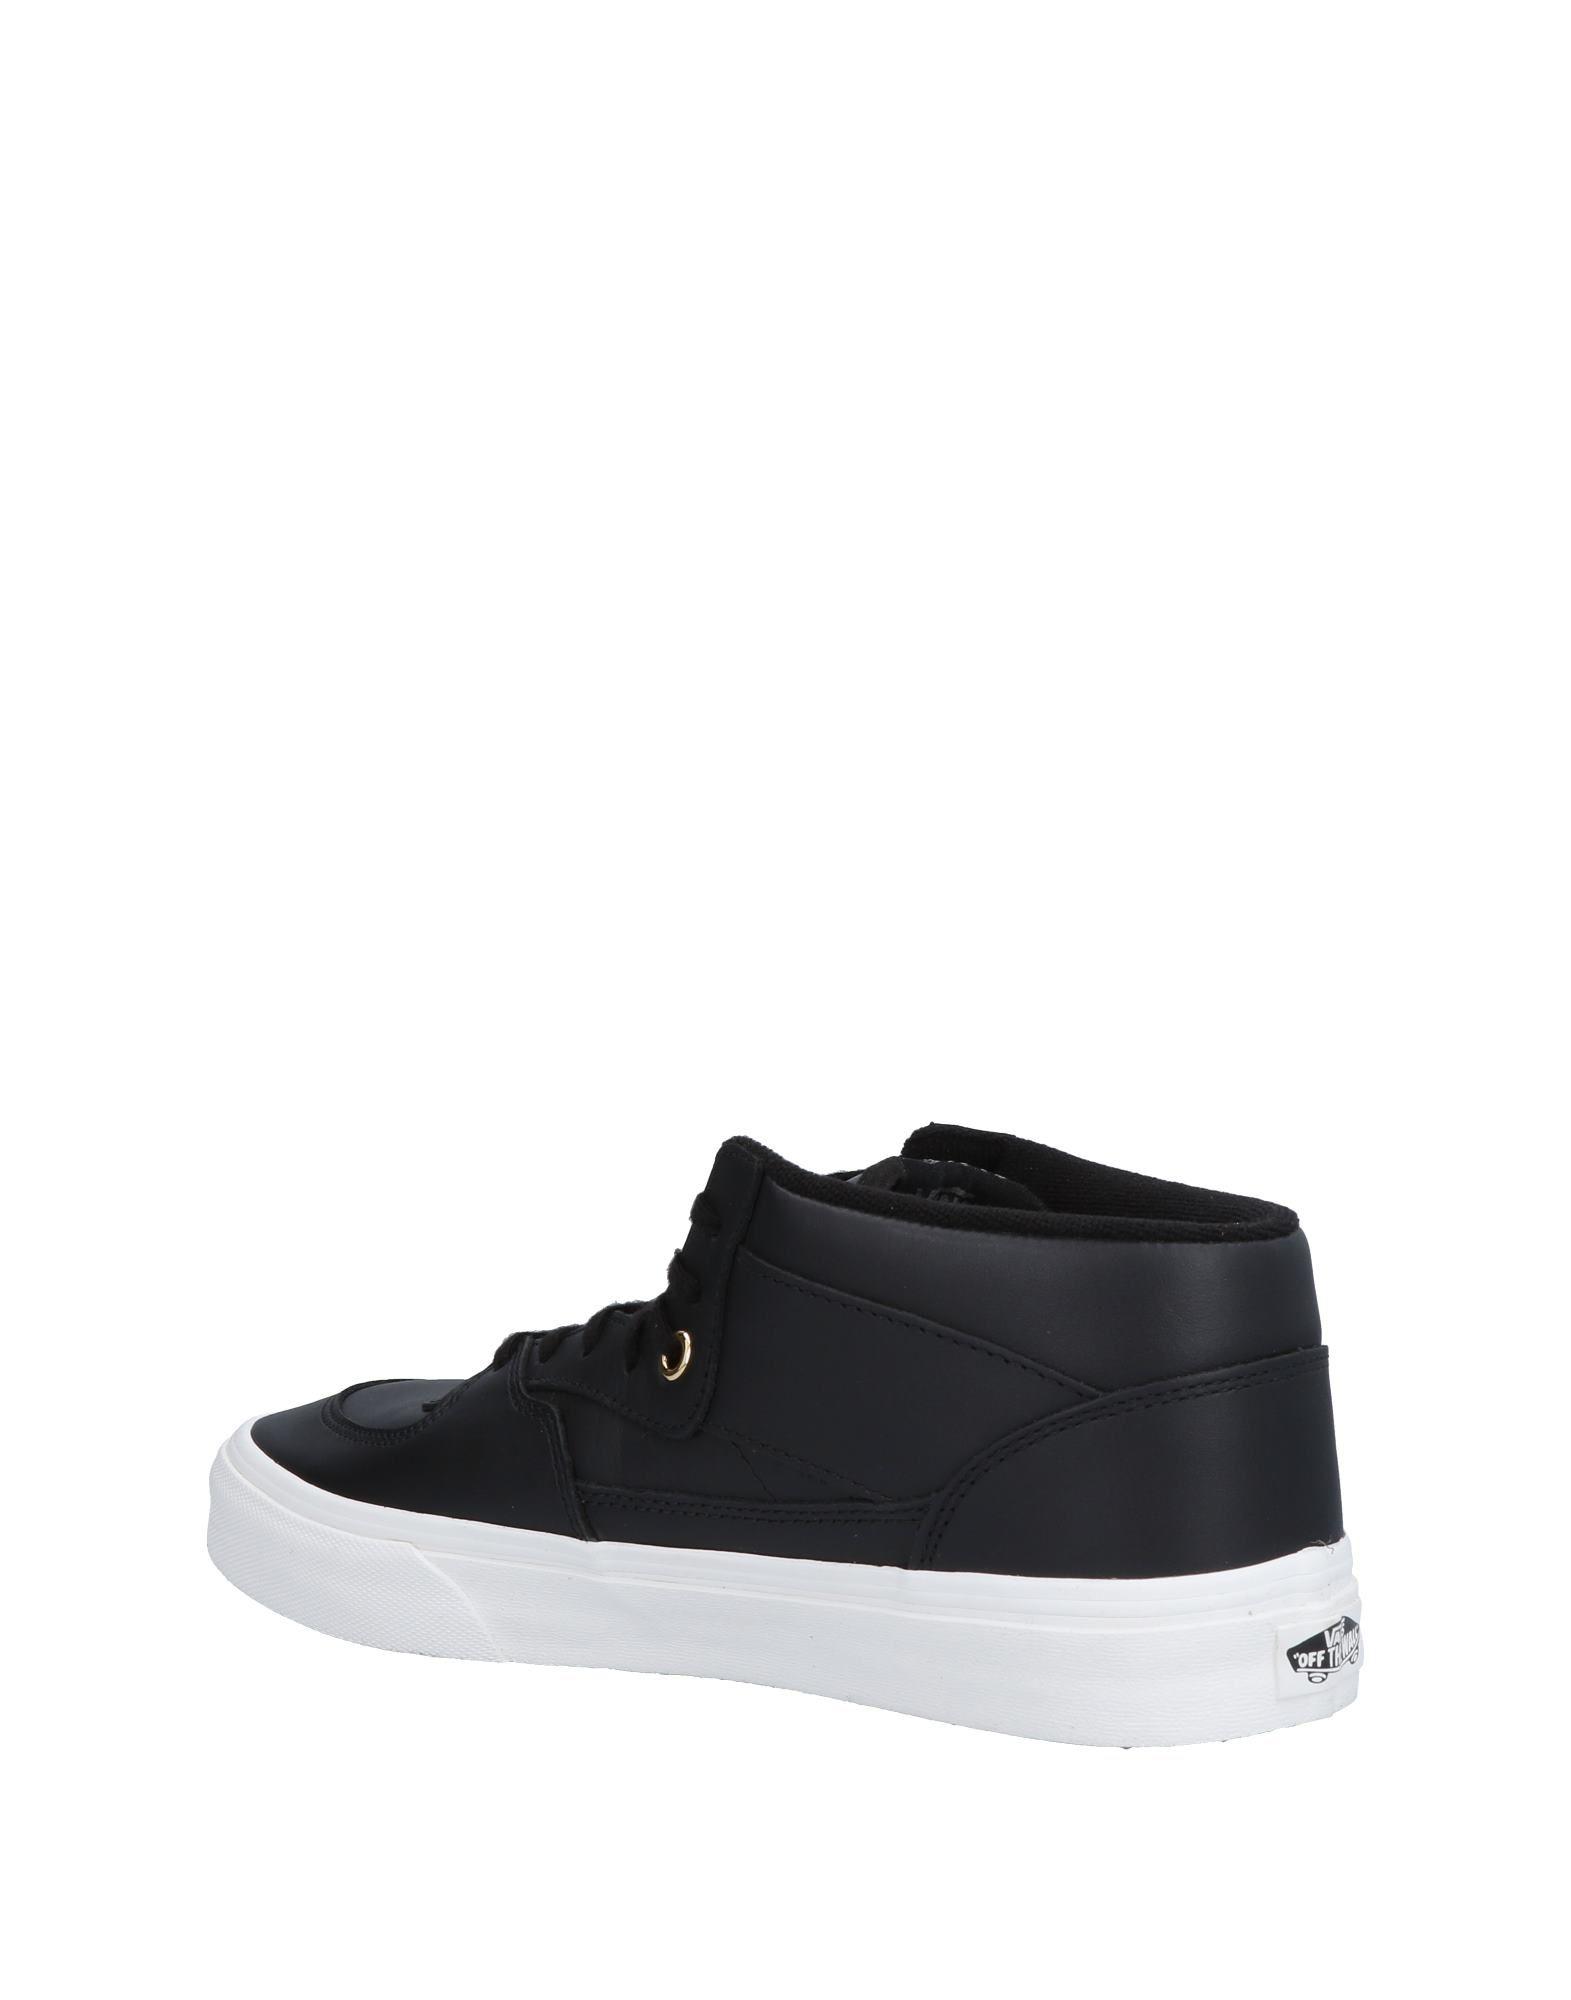 Moda Sneakers Sneakers Moda Vans Uomo - 11495108MW 86ea9b